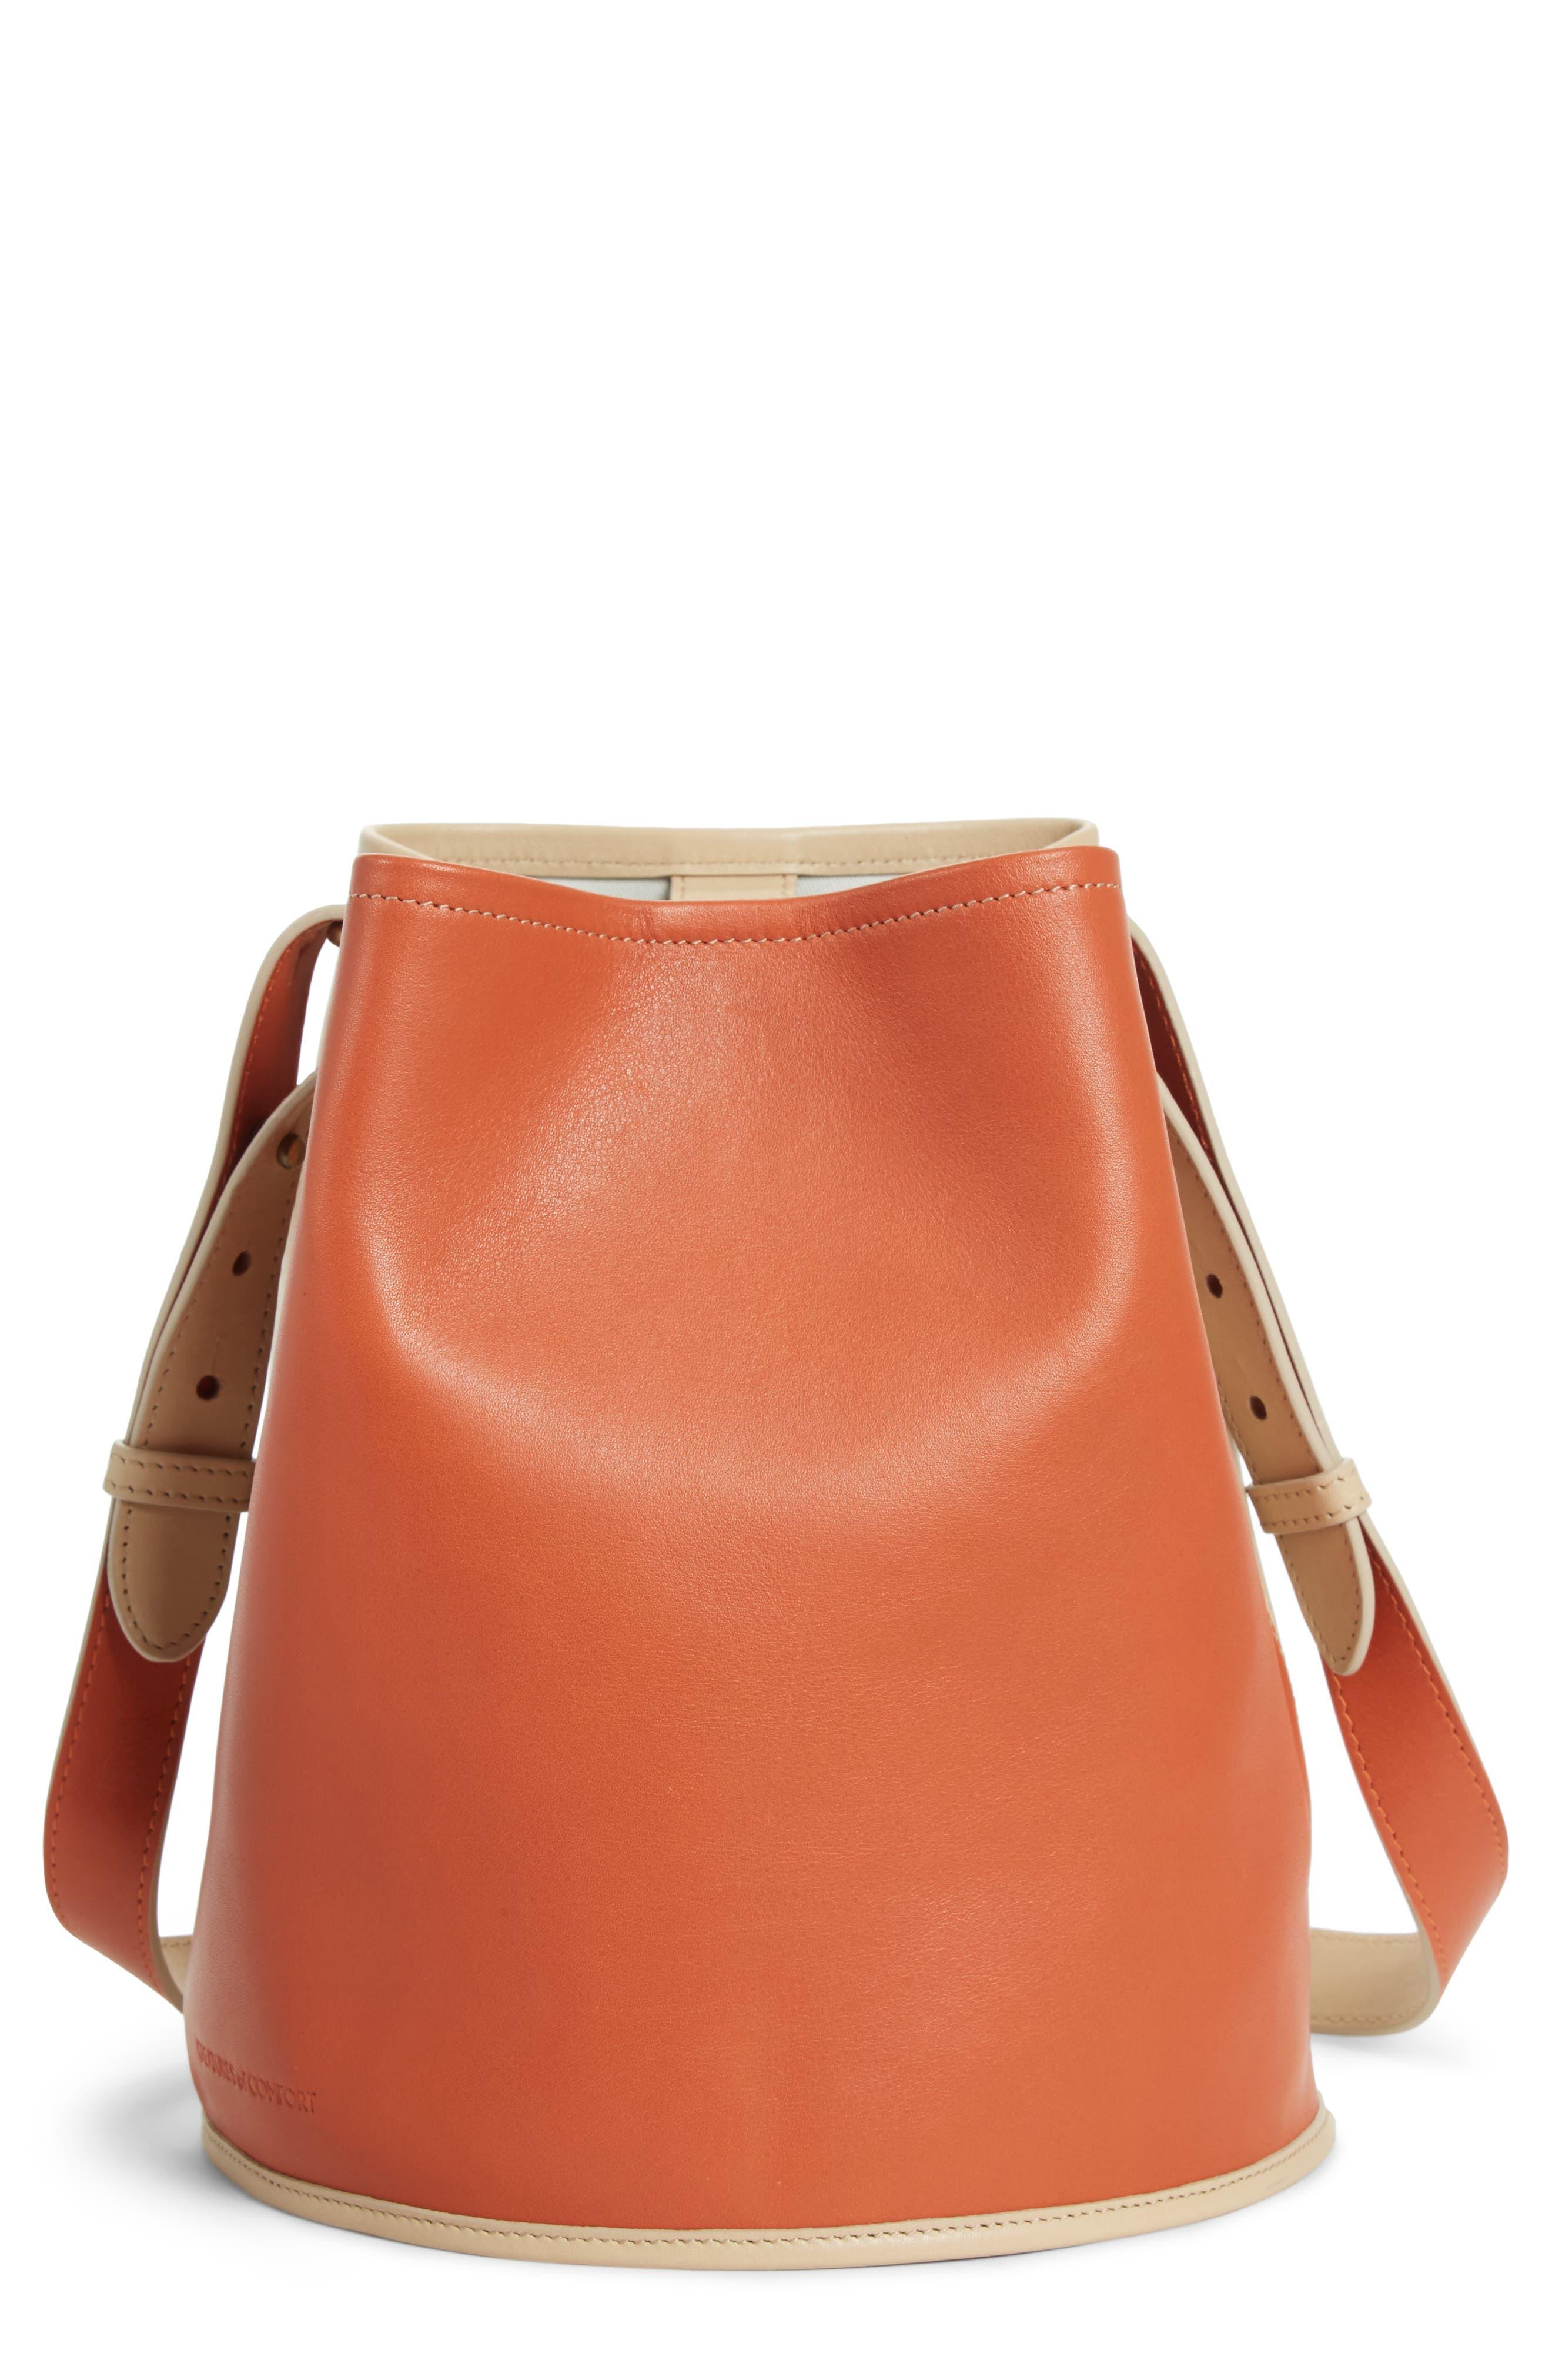 Small Bucket Bicolor Leather Bag,                             Main thumbnail 1, color,                             Clove/ Cappuccino